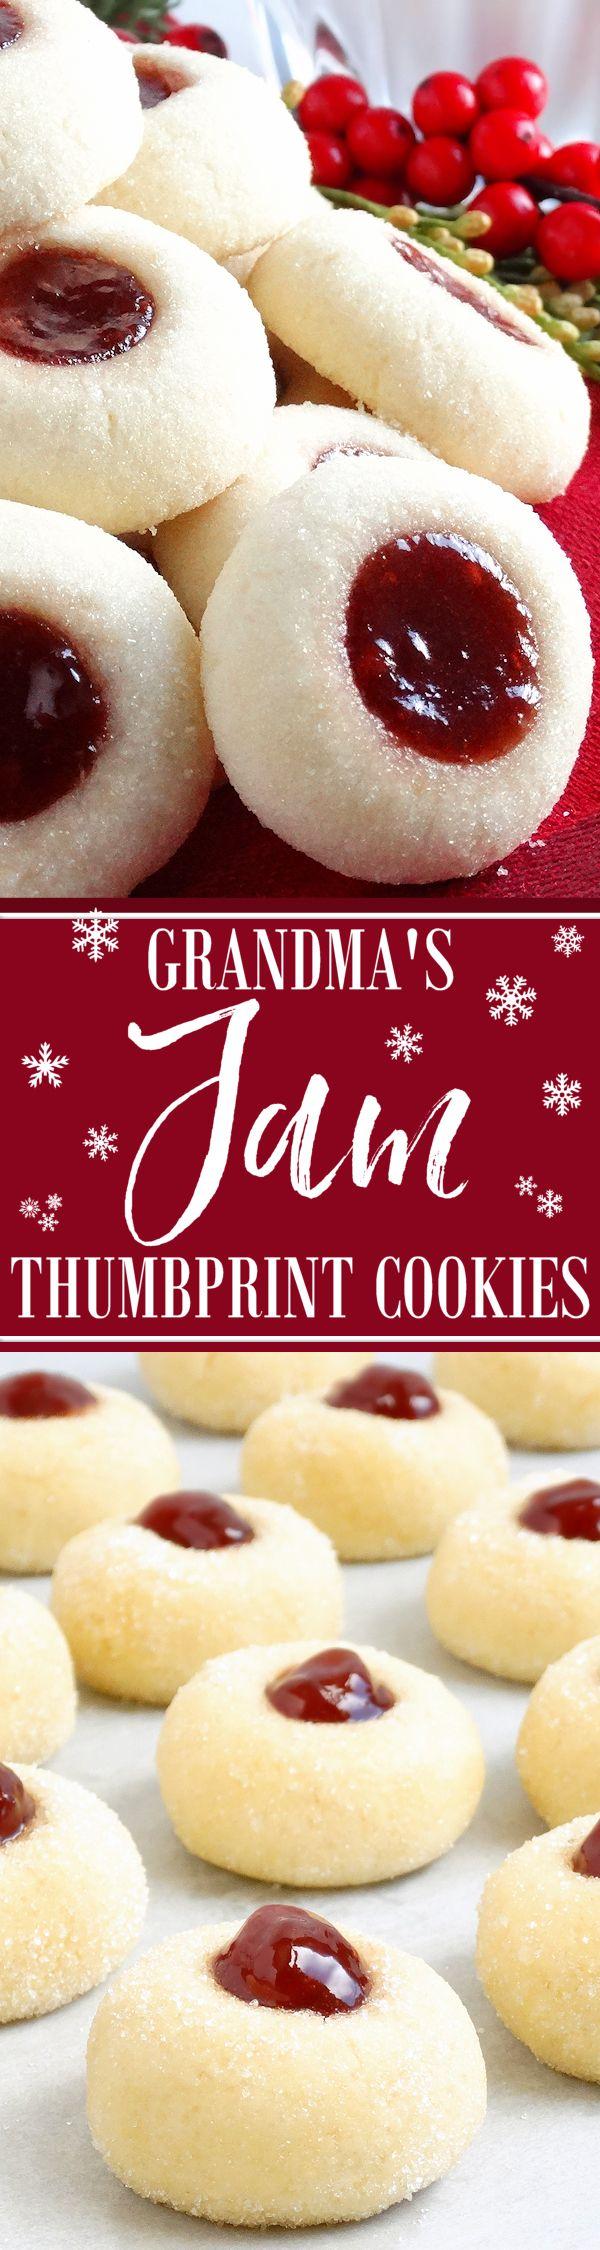 Grandma's Festive Jam Thumbprint Cookies #festivecookies #thumbprintcookies